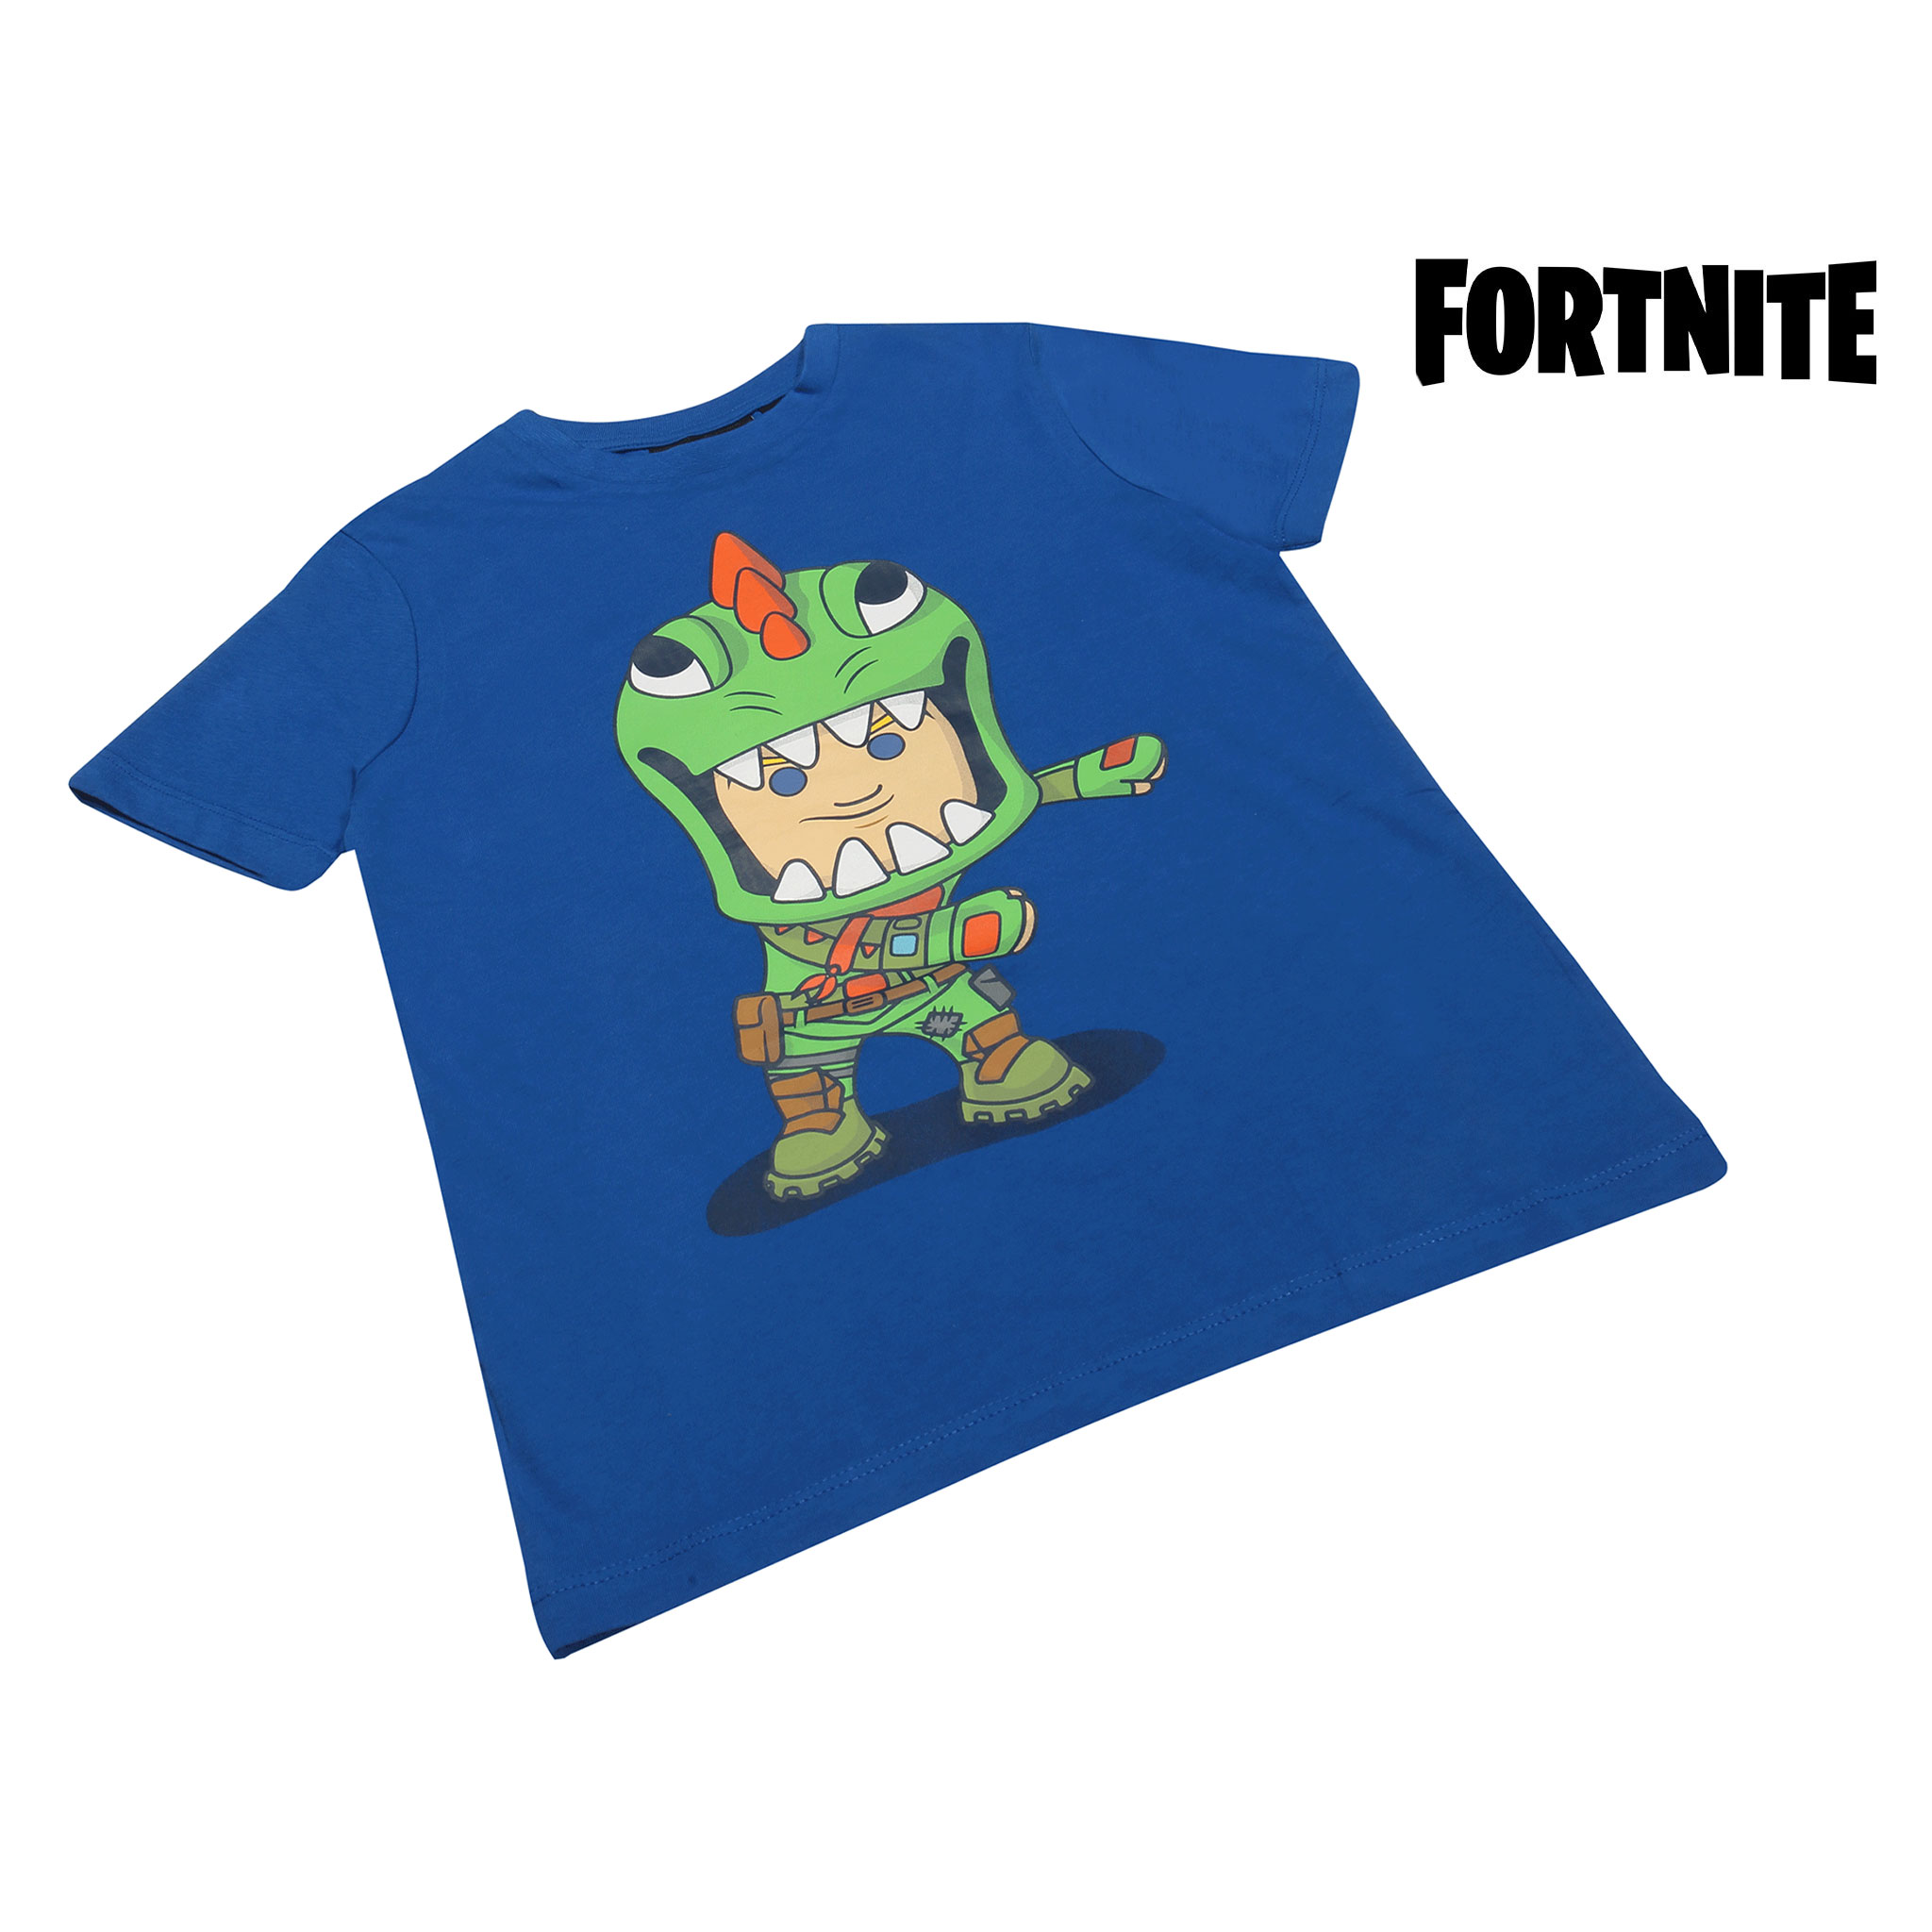 miniature 8 - Boys Fortnite T Shirt Flossing Rex Official Blue